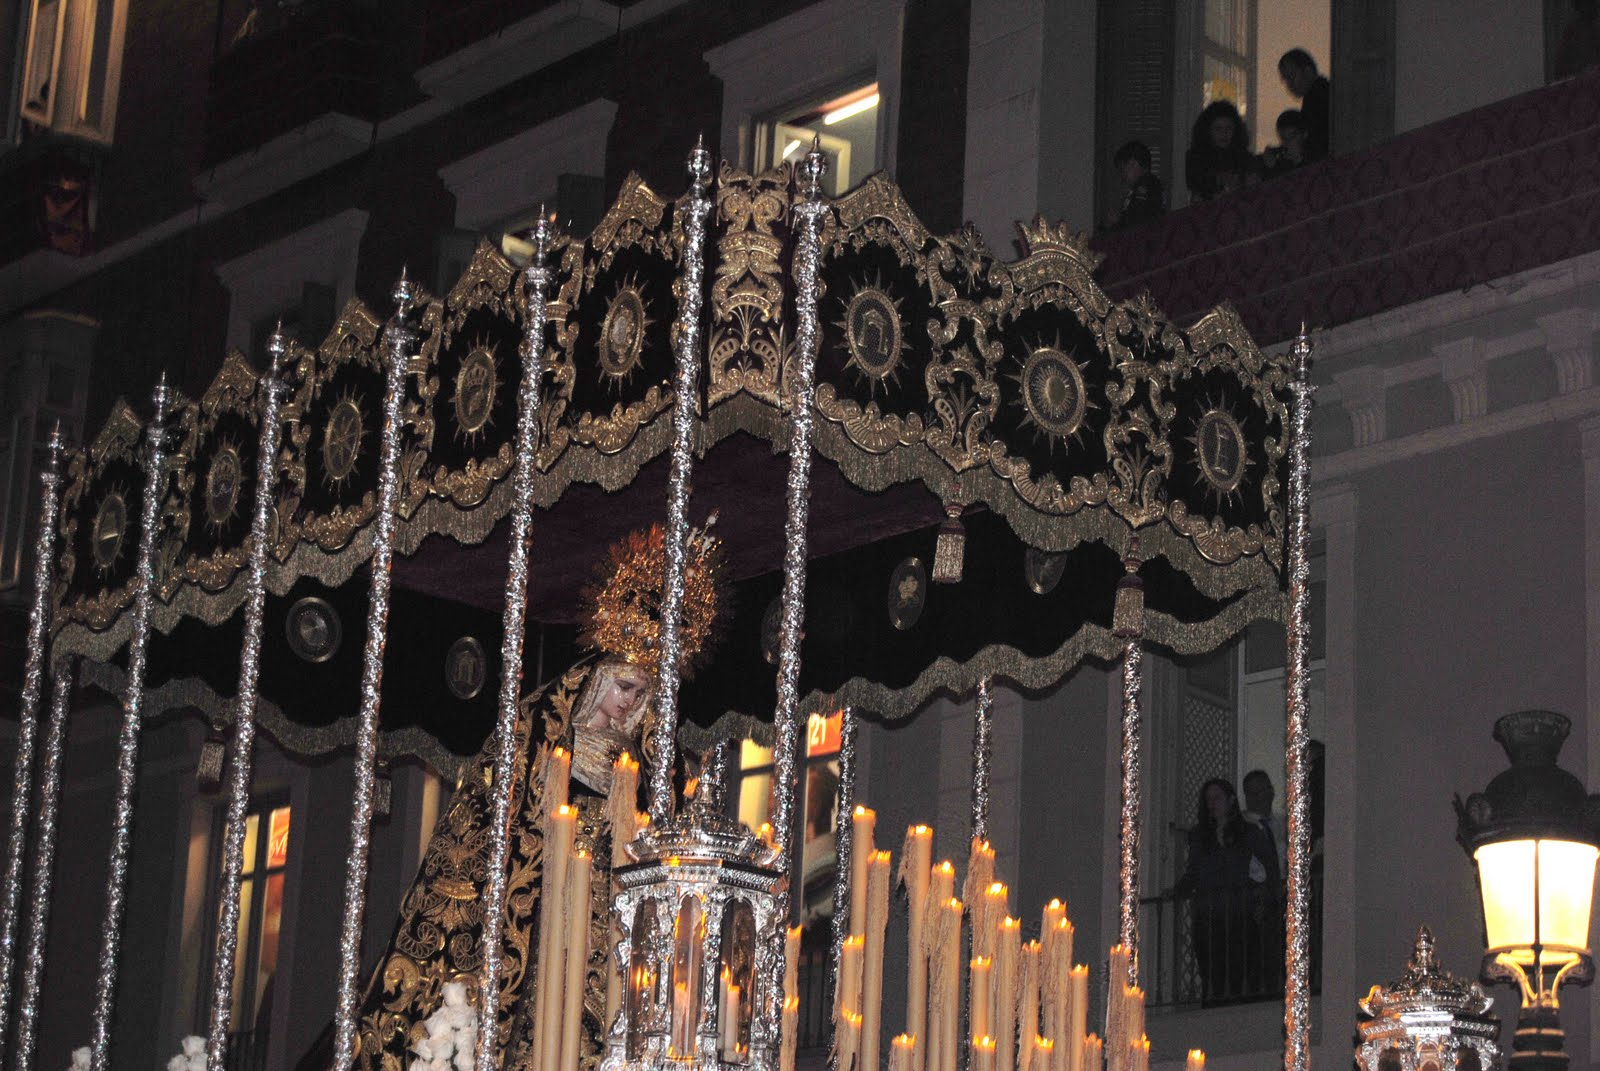 Corazones cofrades fotos pasi n m laga 2010 2 for Pasion amistad malaga